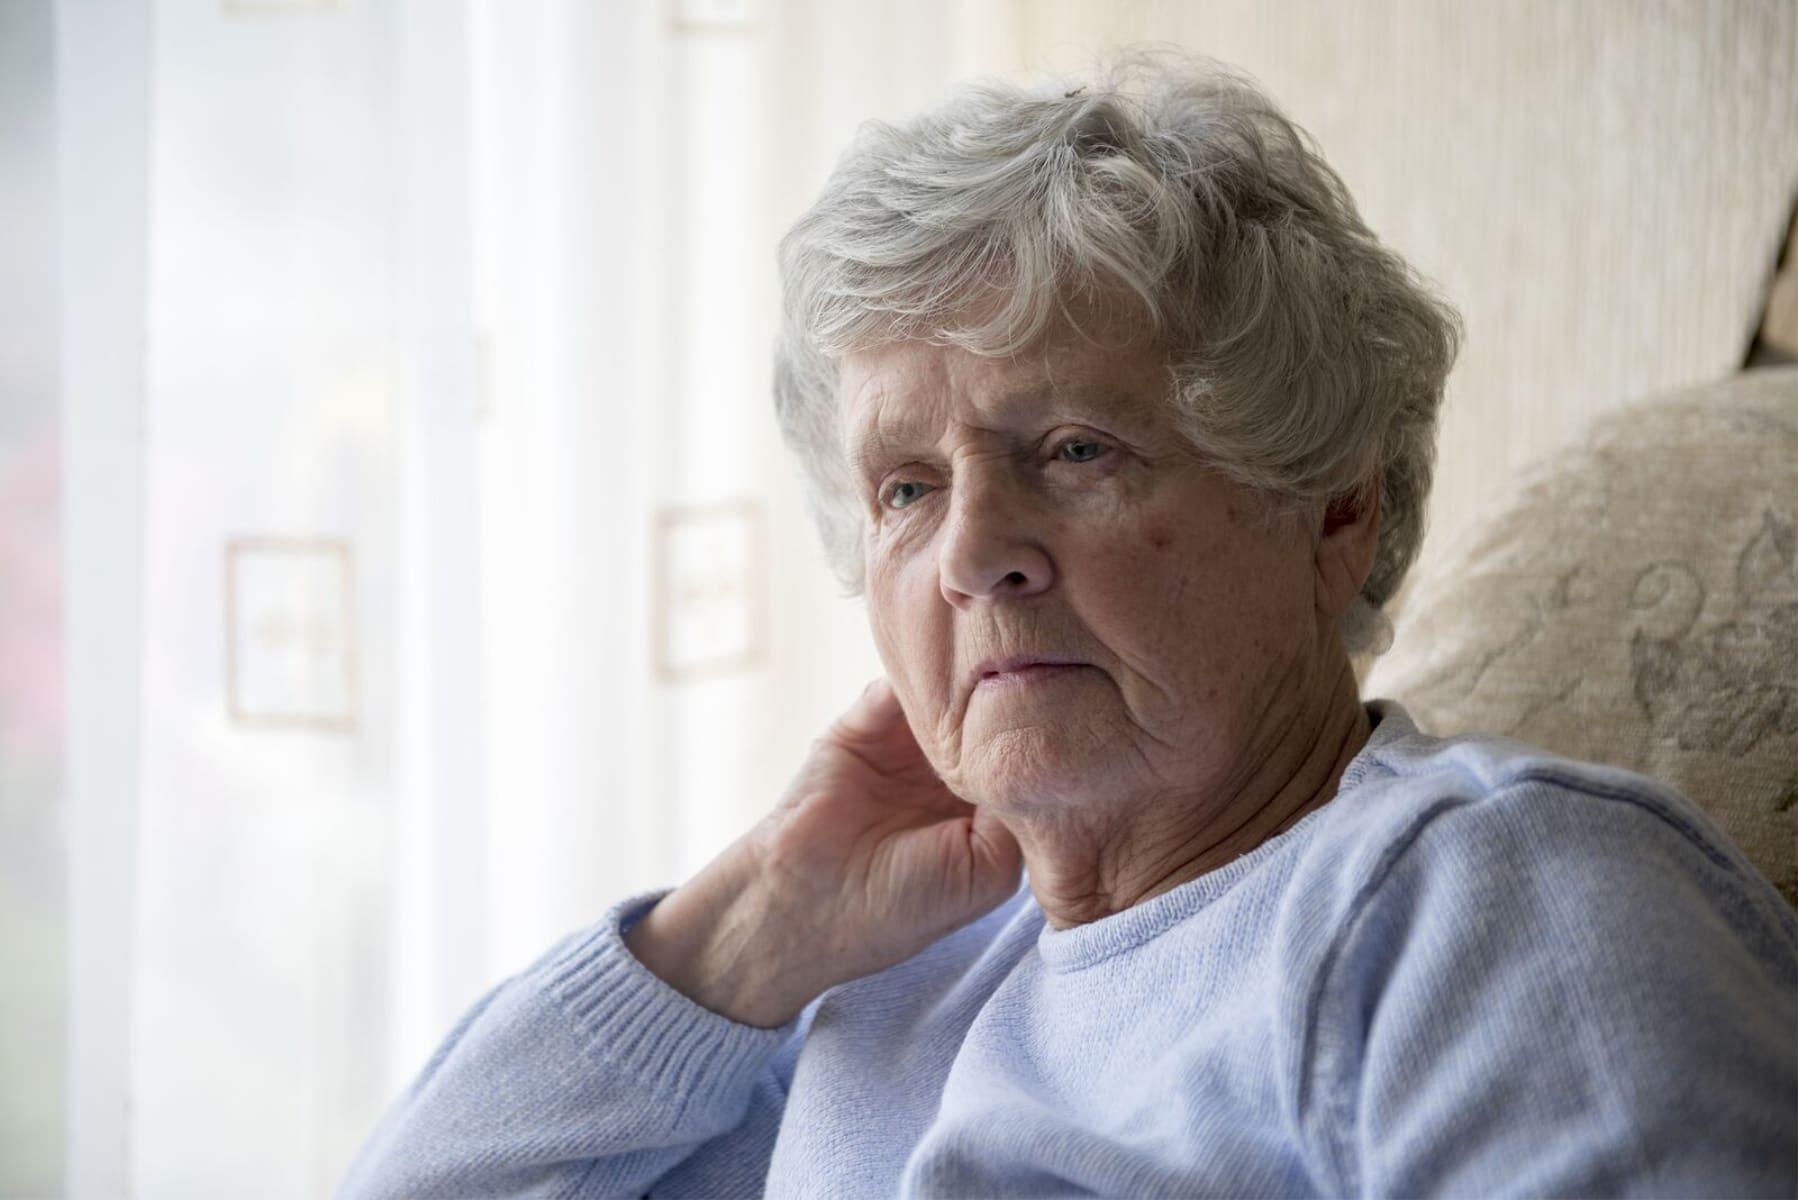 Home Care Services in Tempe AZ: Five Struggles